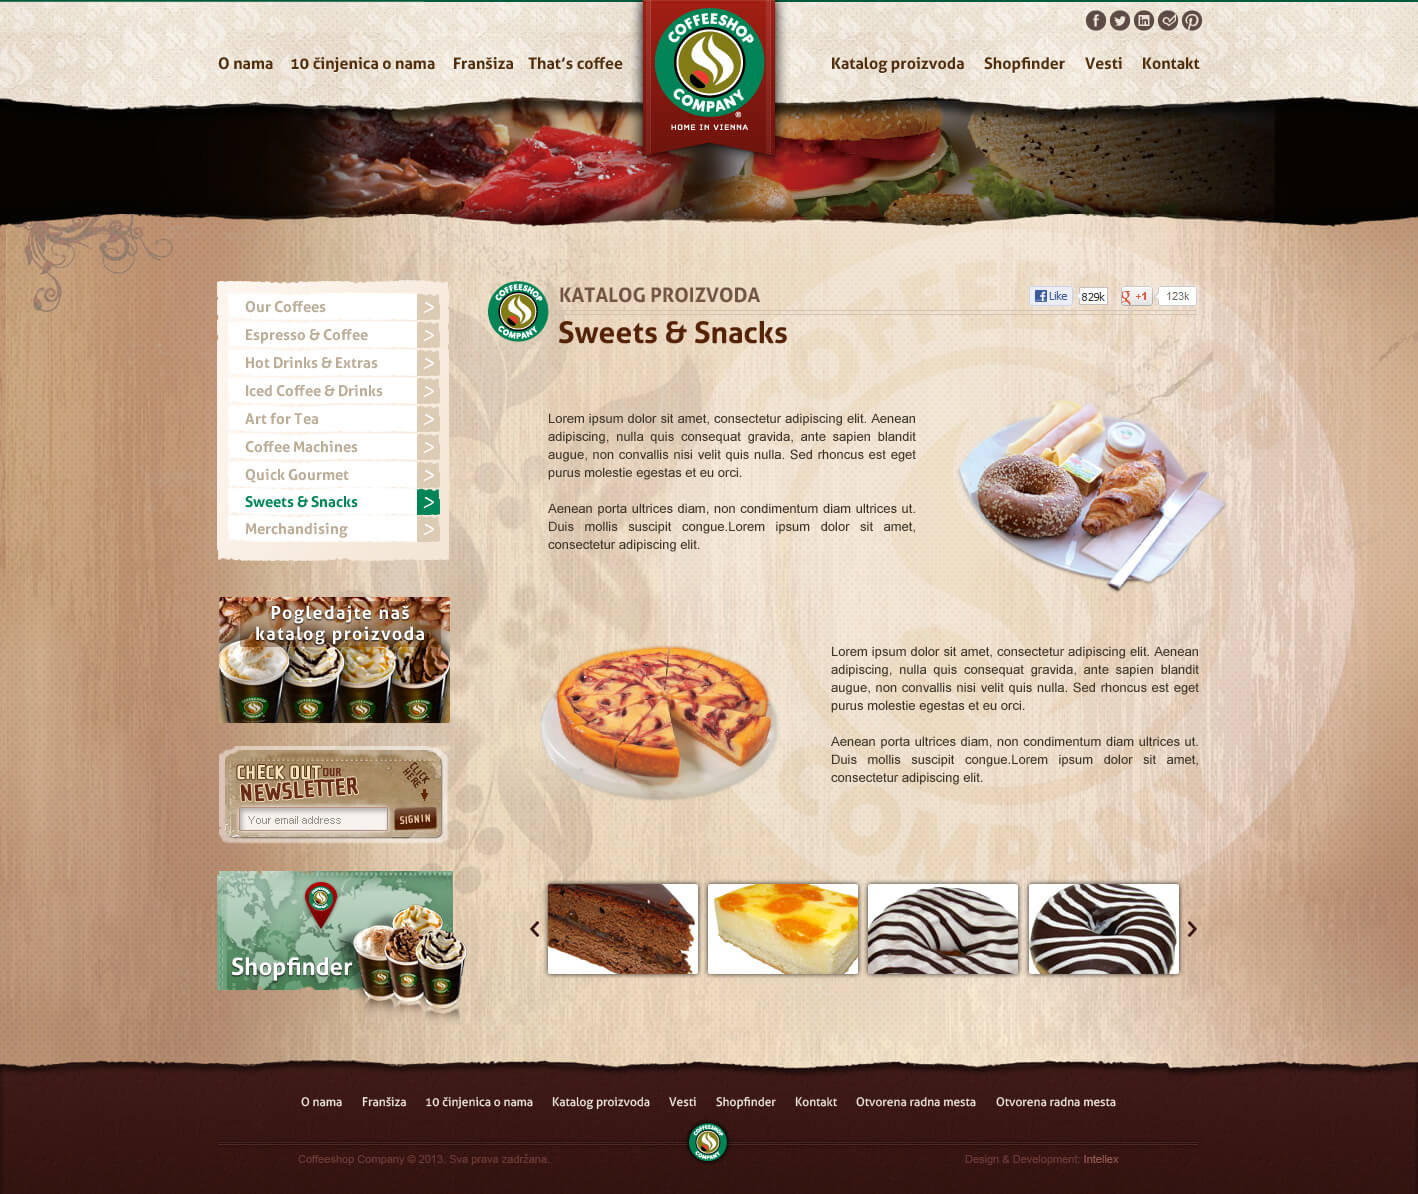 Coffeeshop Company, Vienna Coffee Shop: addresses, menus